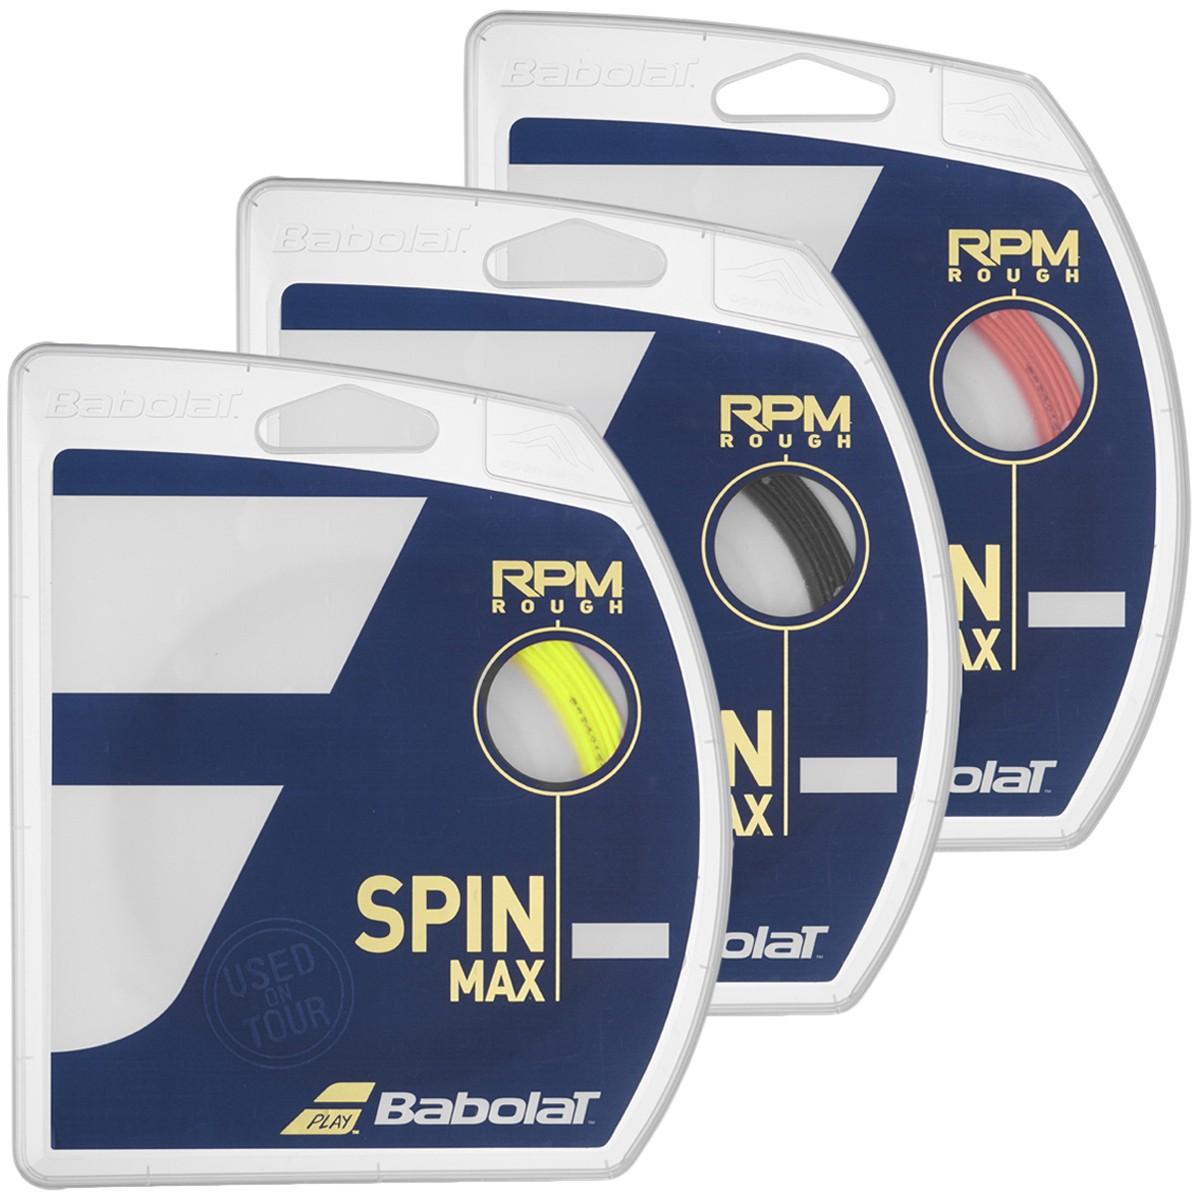 CORDAJE BABOLAT RPM BLAST ROUGH (12 METROS)